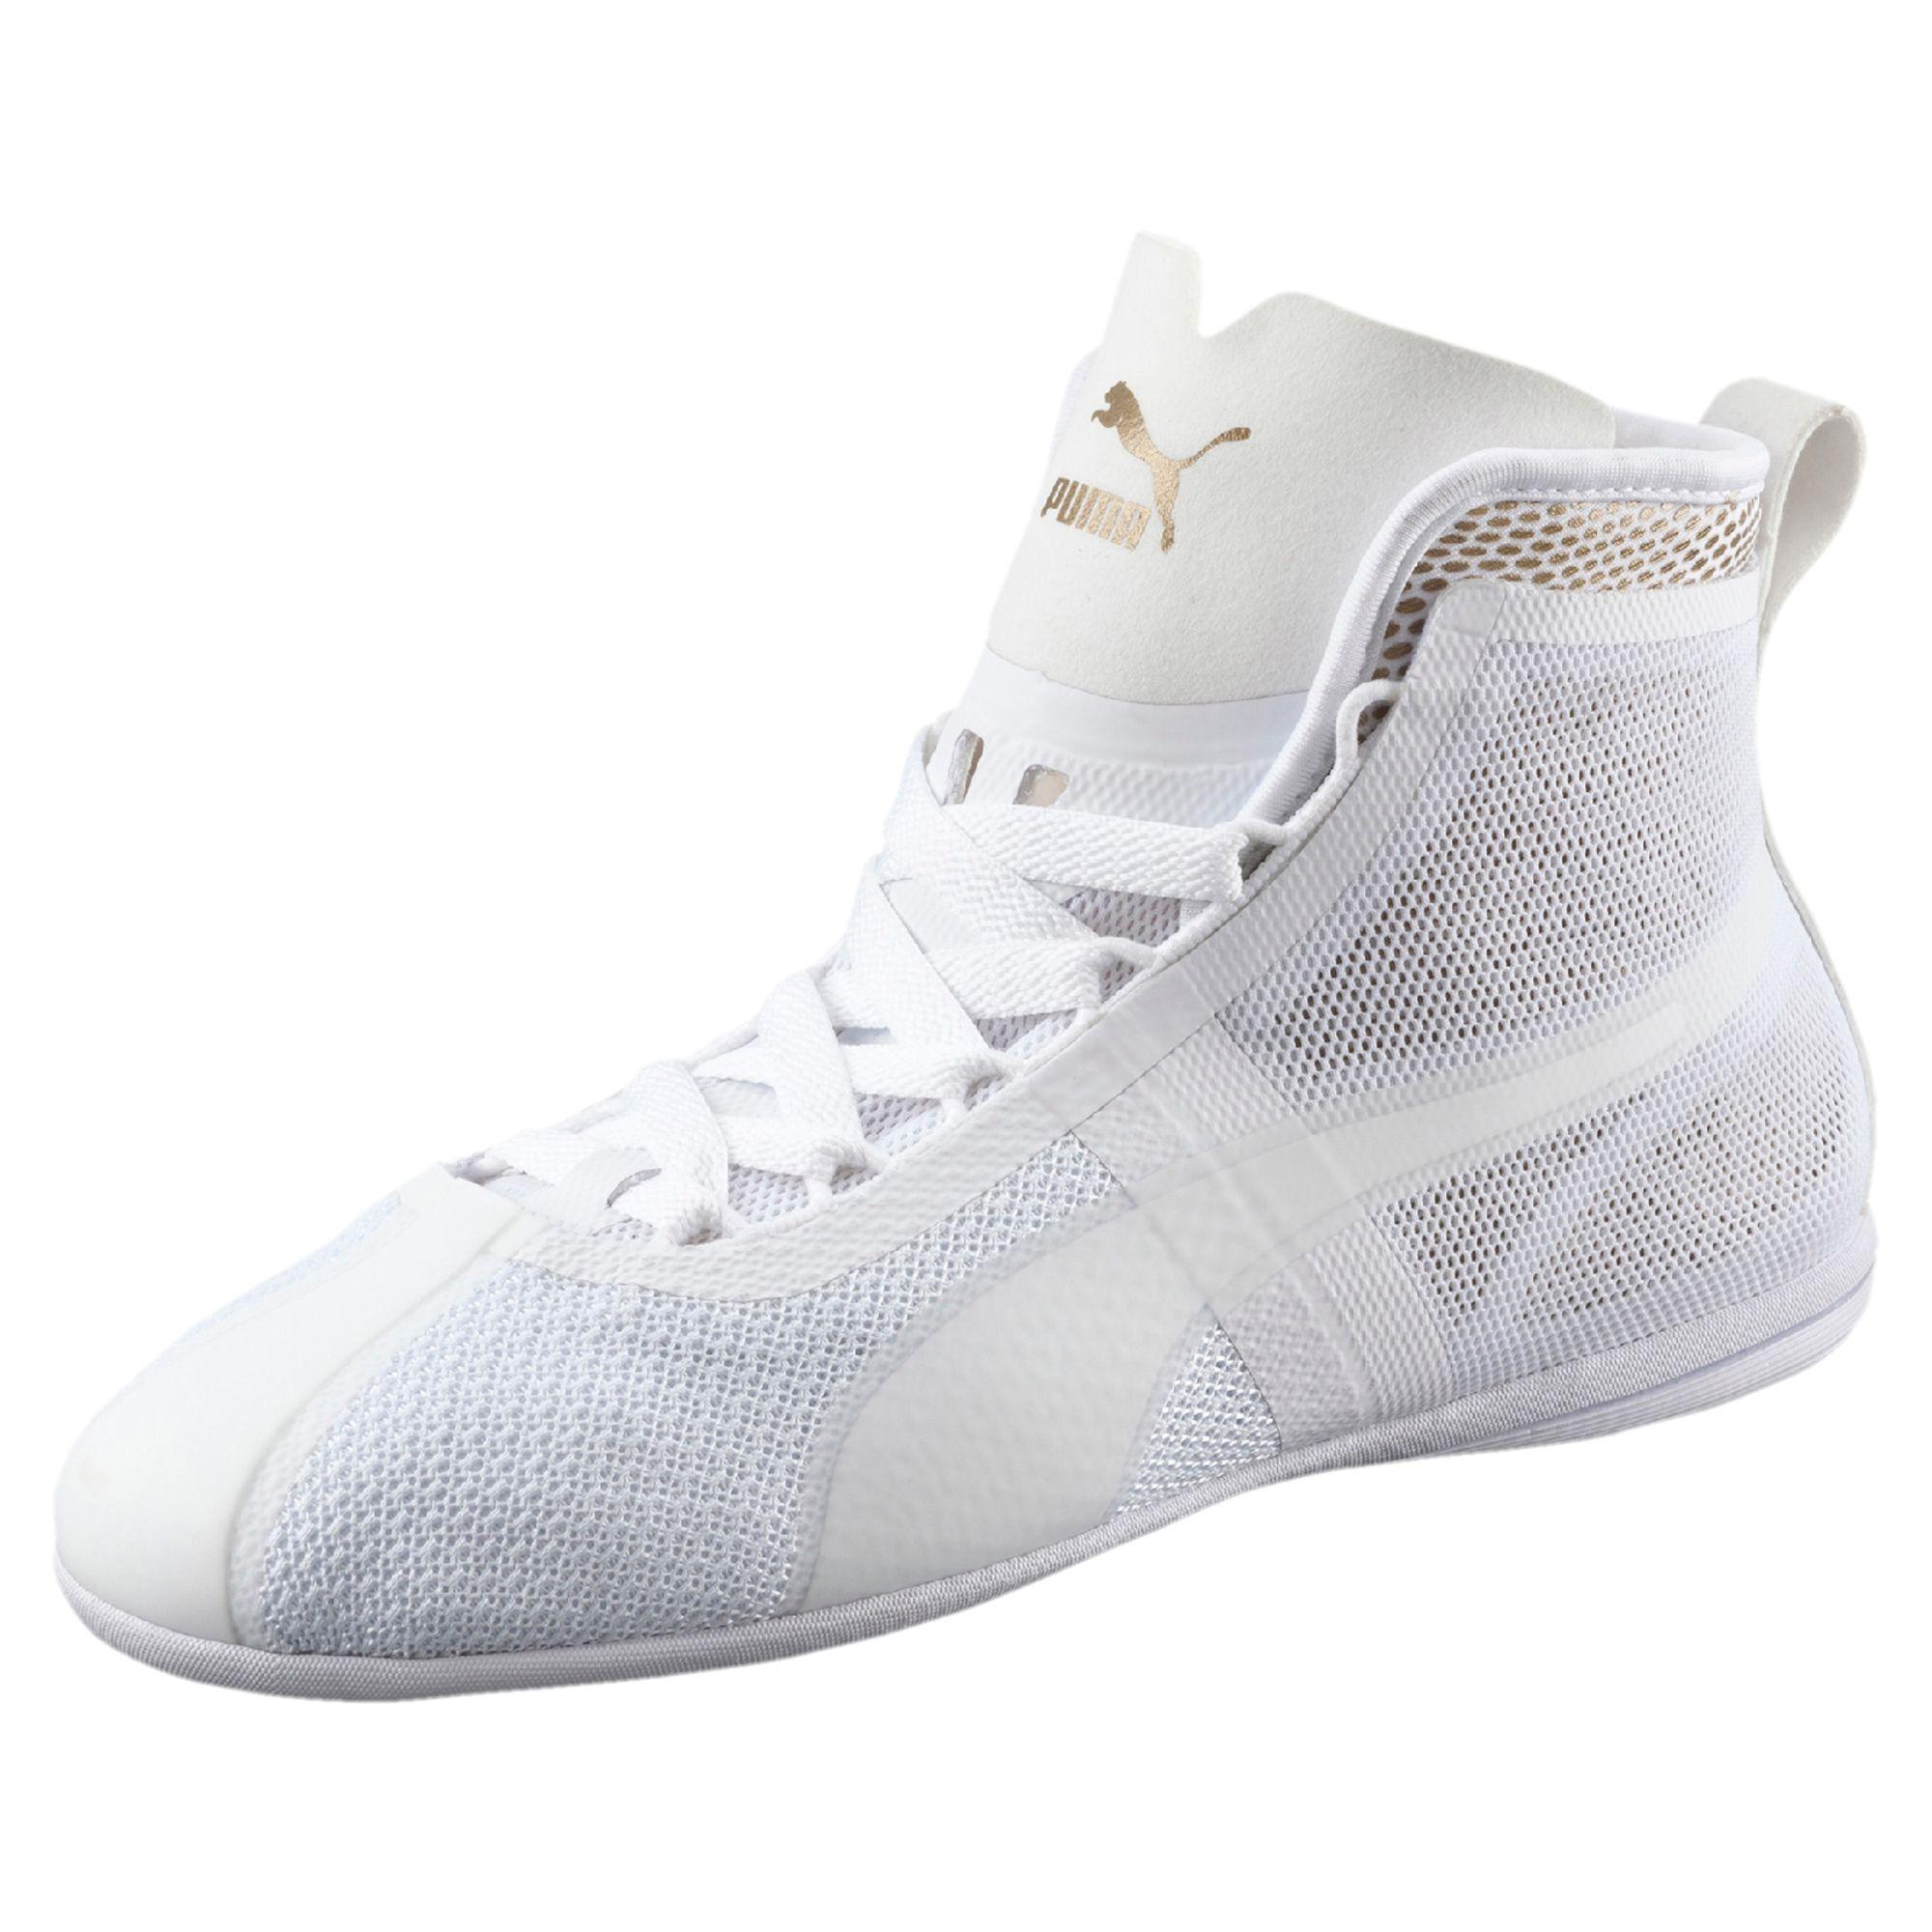 Fierce Strap Swirl, Chaussures de Fitness Femme, Noir (Black-White), 39 EUPuma